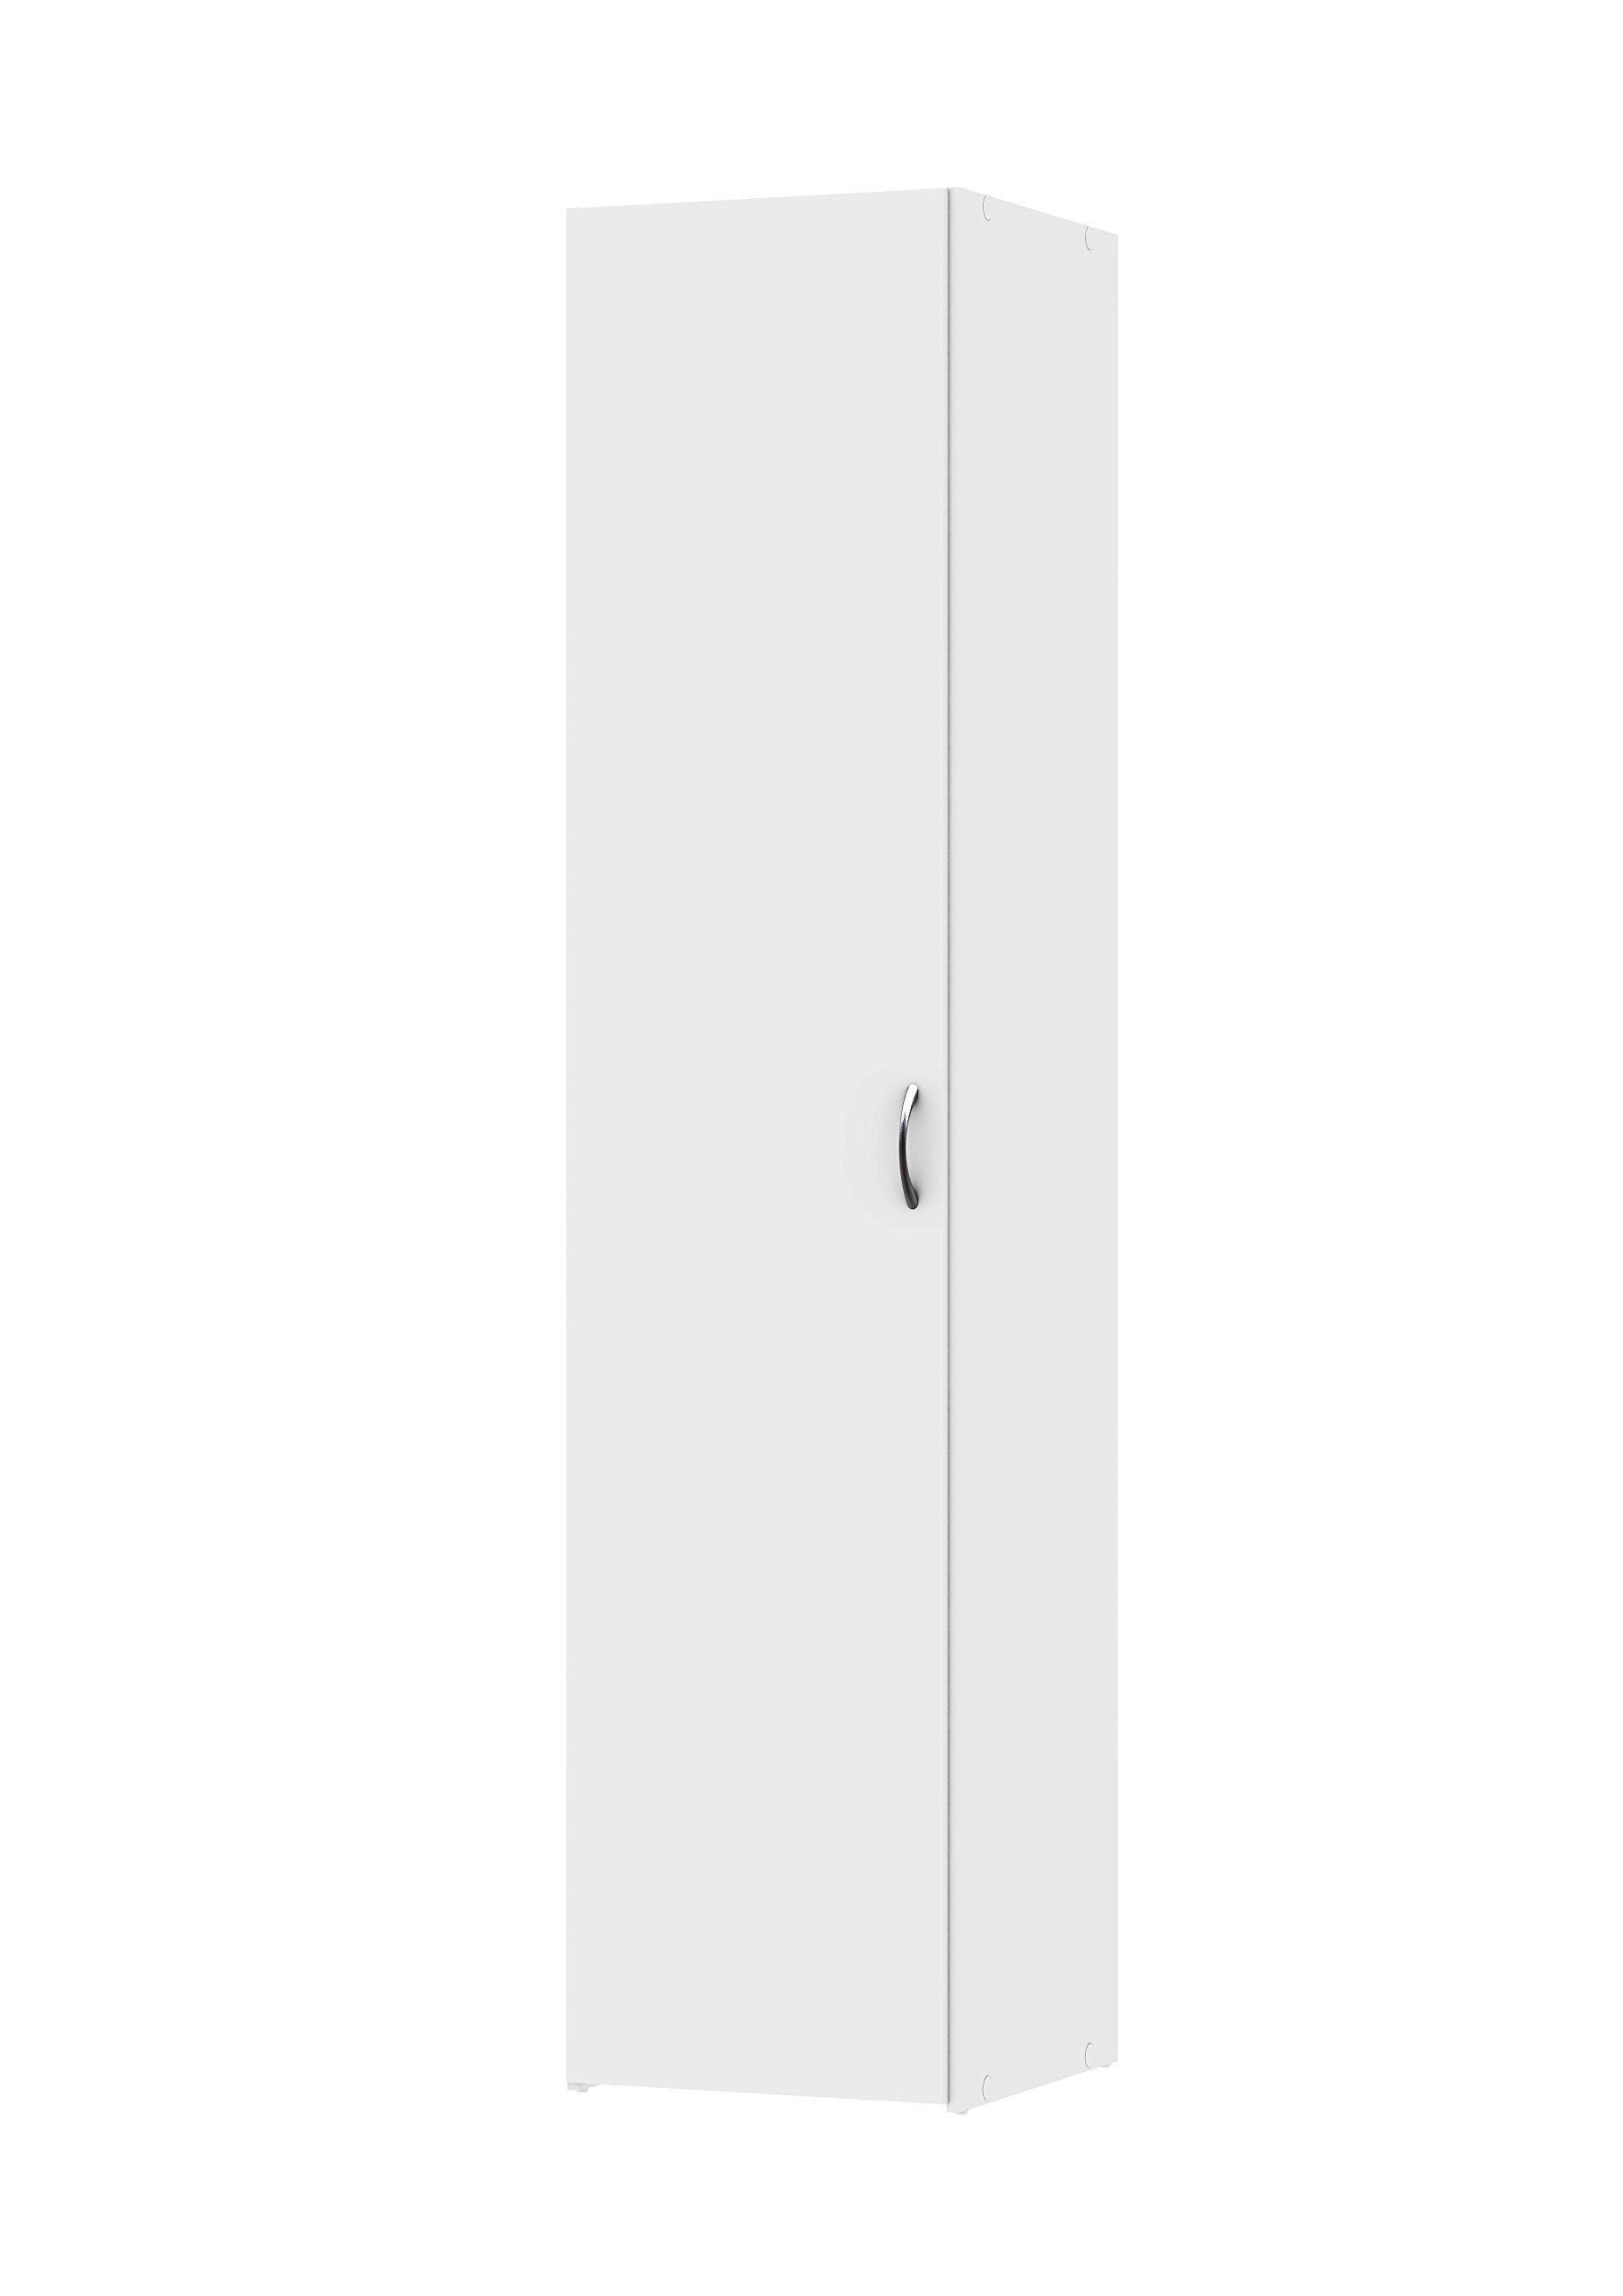 Tvilum 704364949 Space Wardrobe with with 1 Door, White